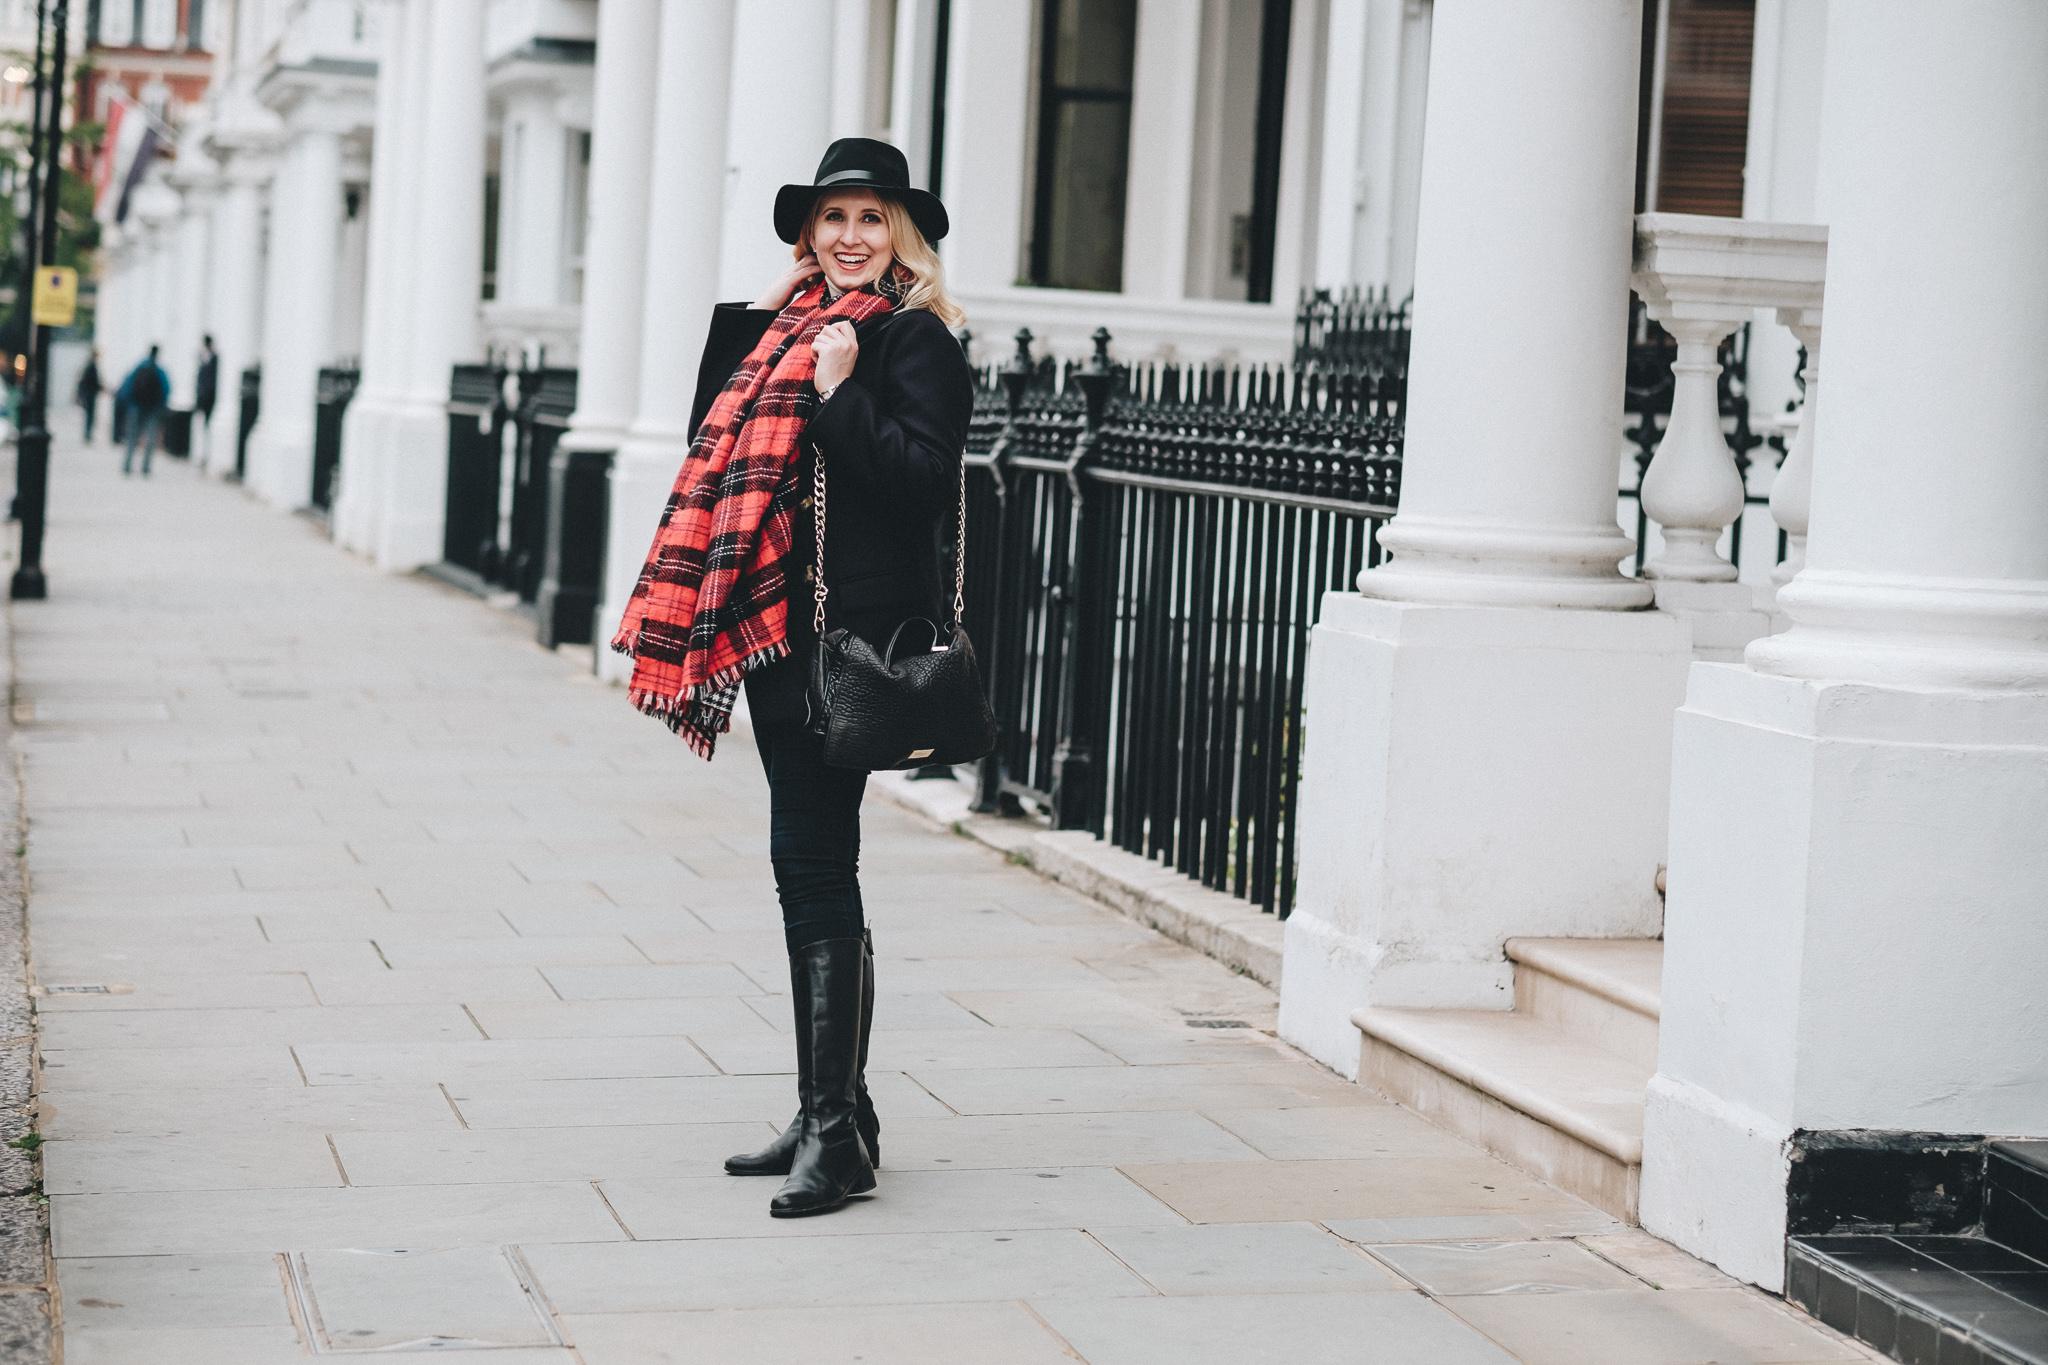 FXT18666 London Personal Brand Photographer Hayley Richardson | The London Mews | Personal Brand Photography